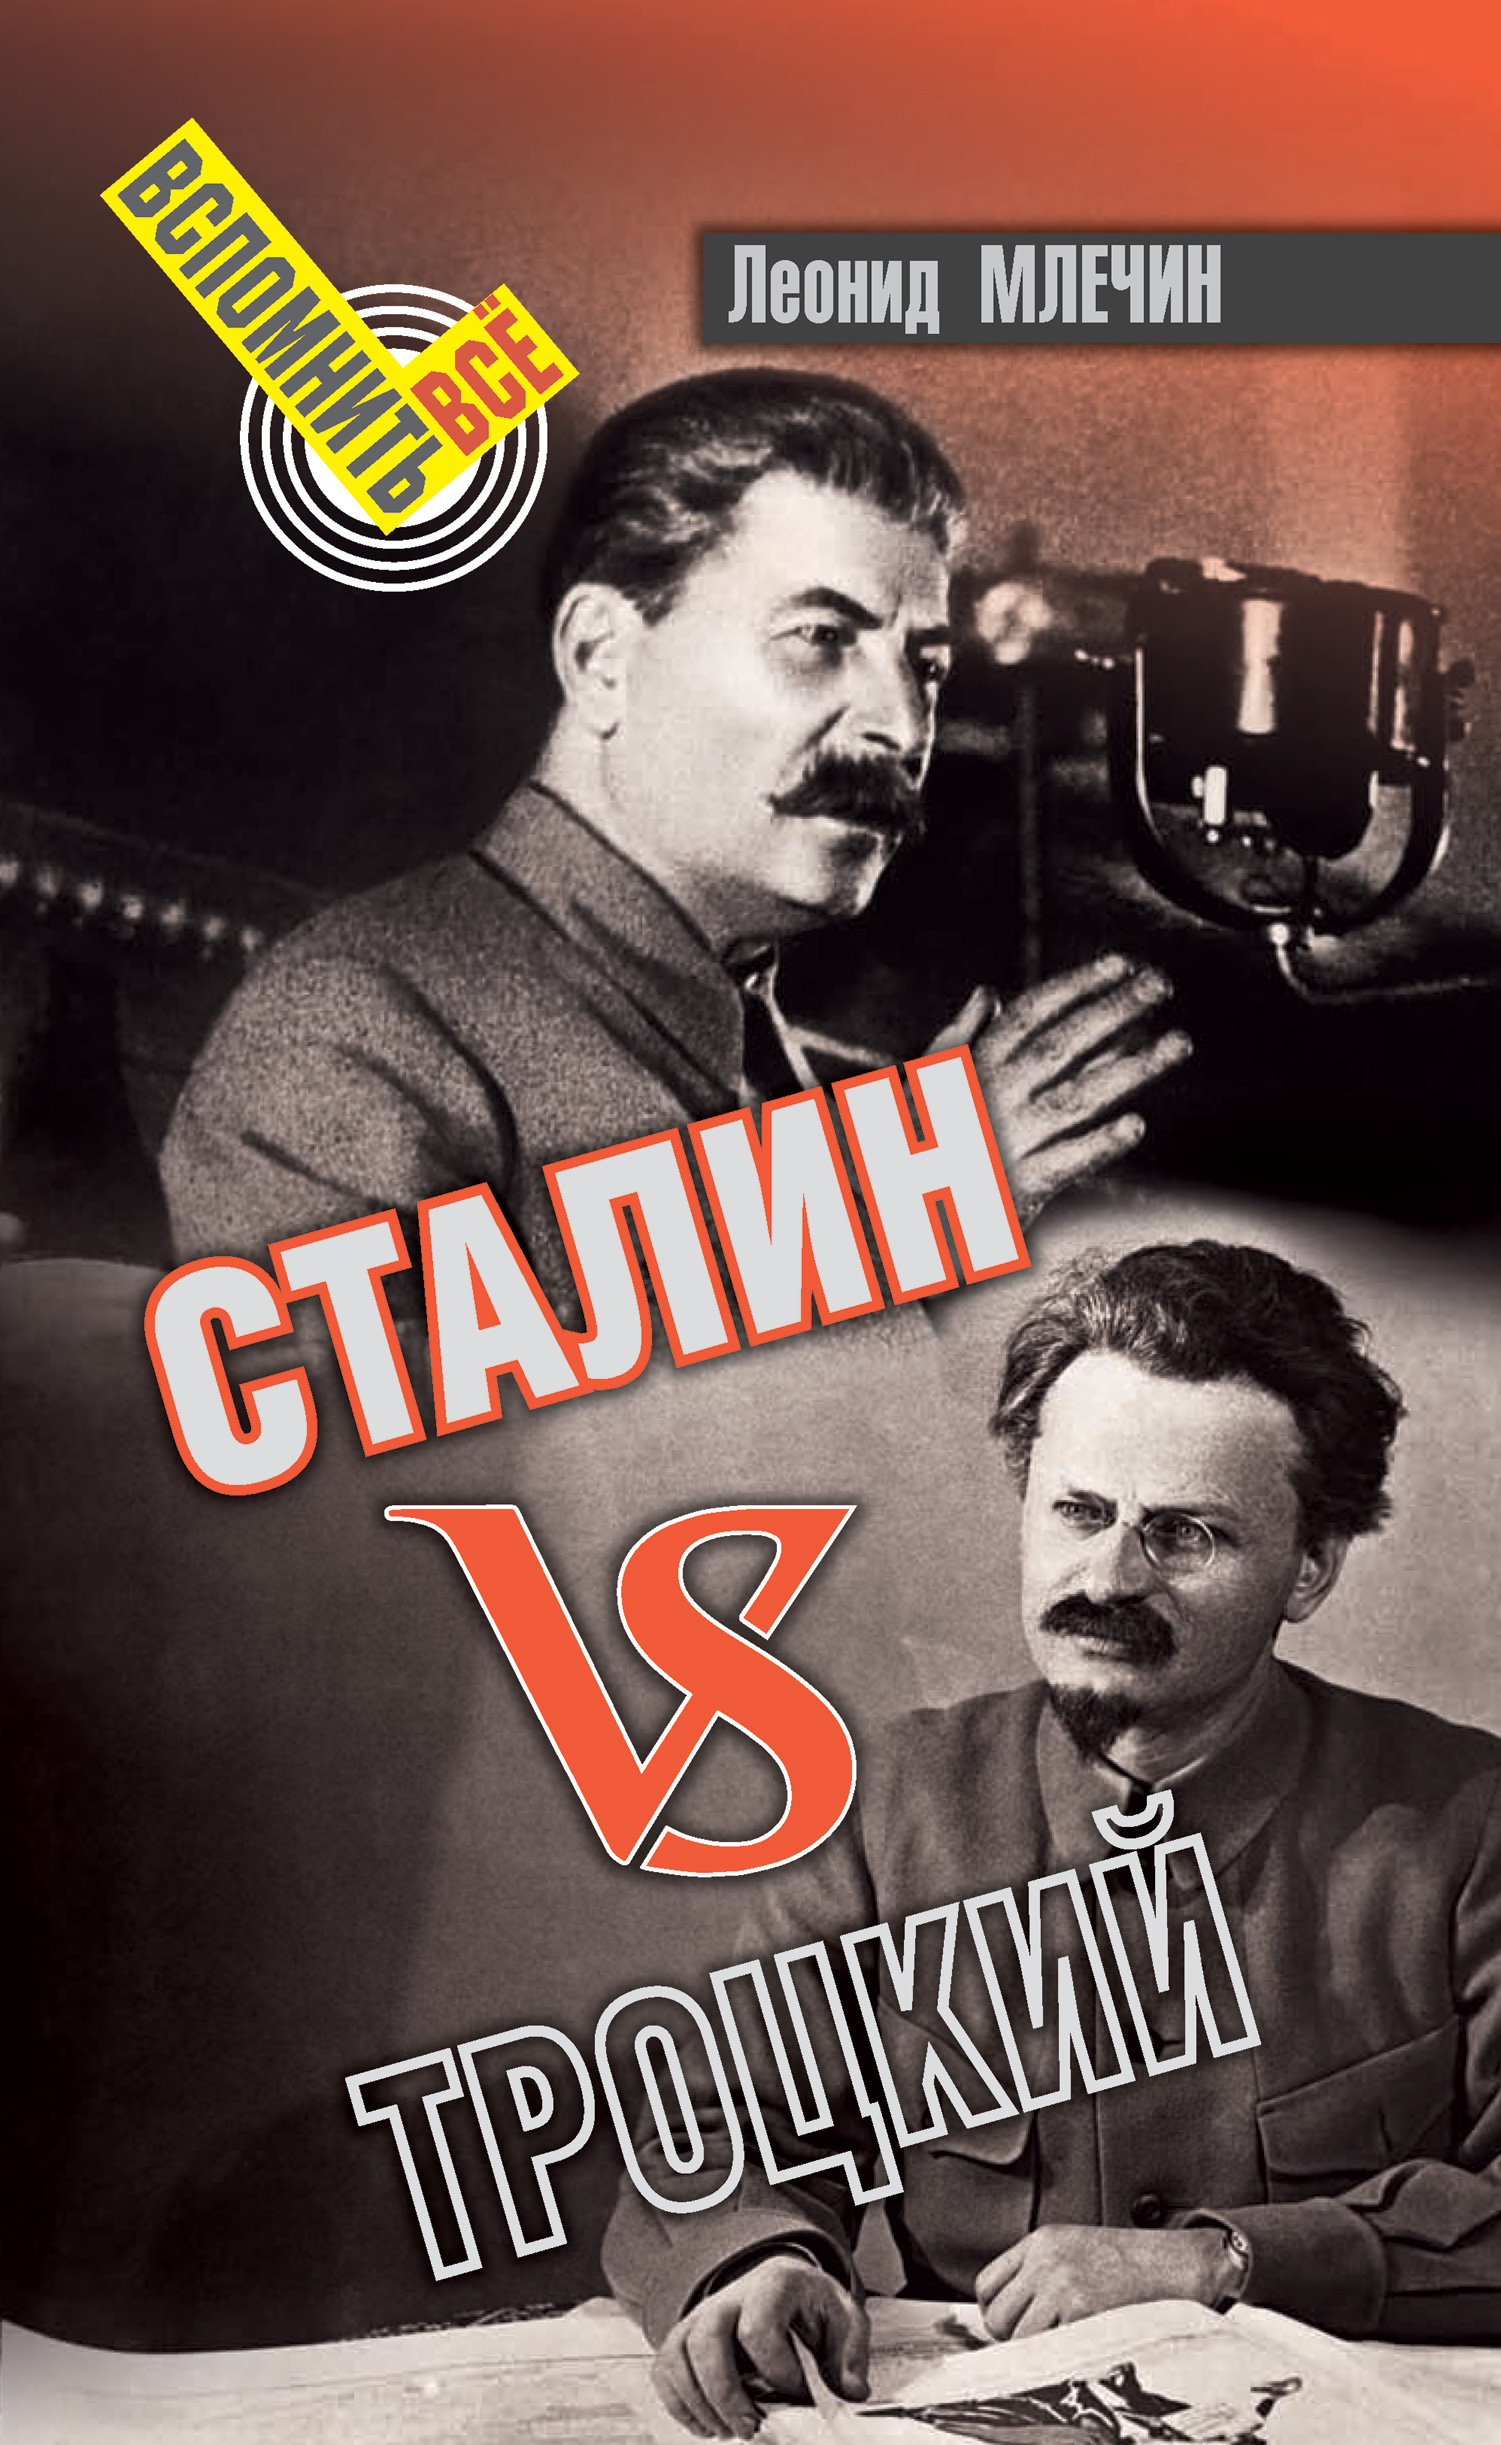 Леонид Млечин Сталин VS Троцкий троцкий л сталин том i